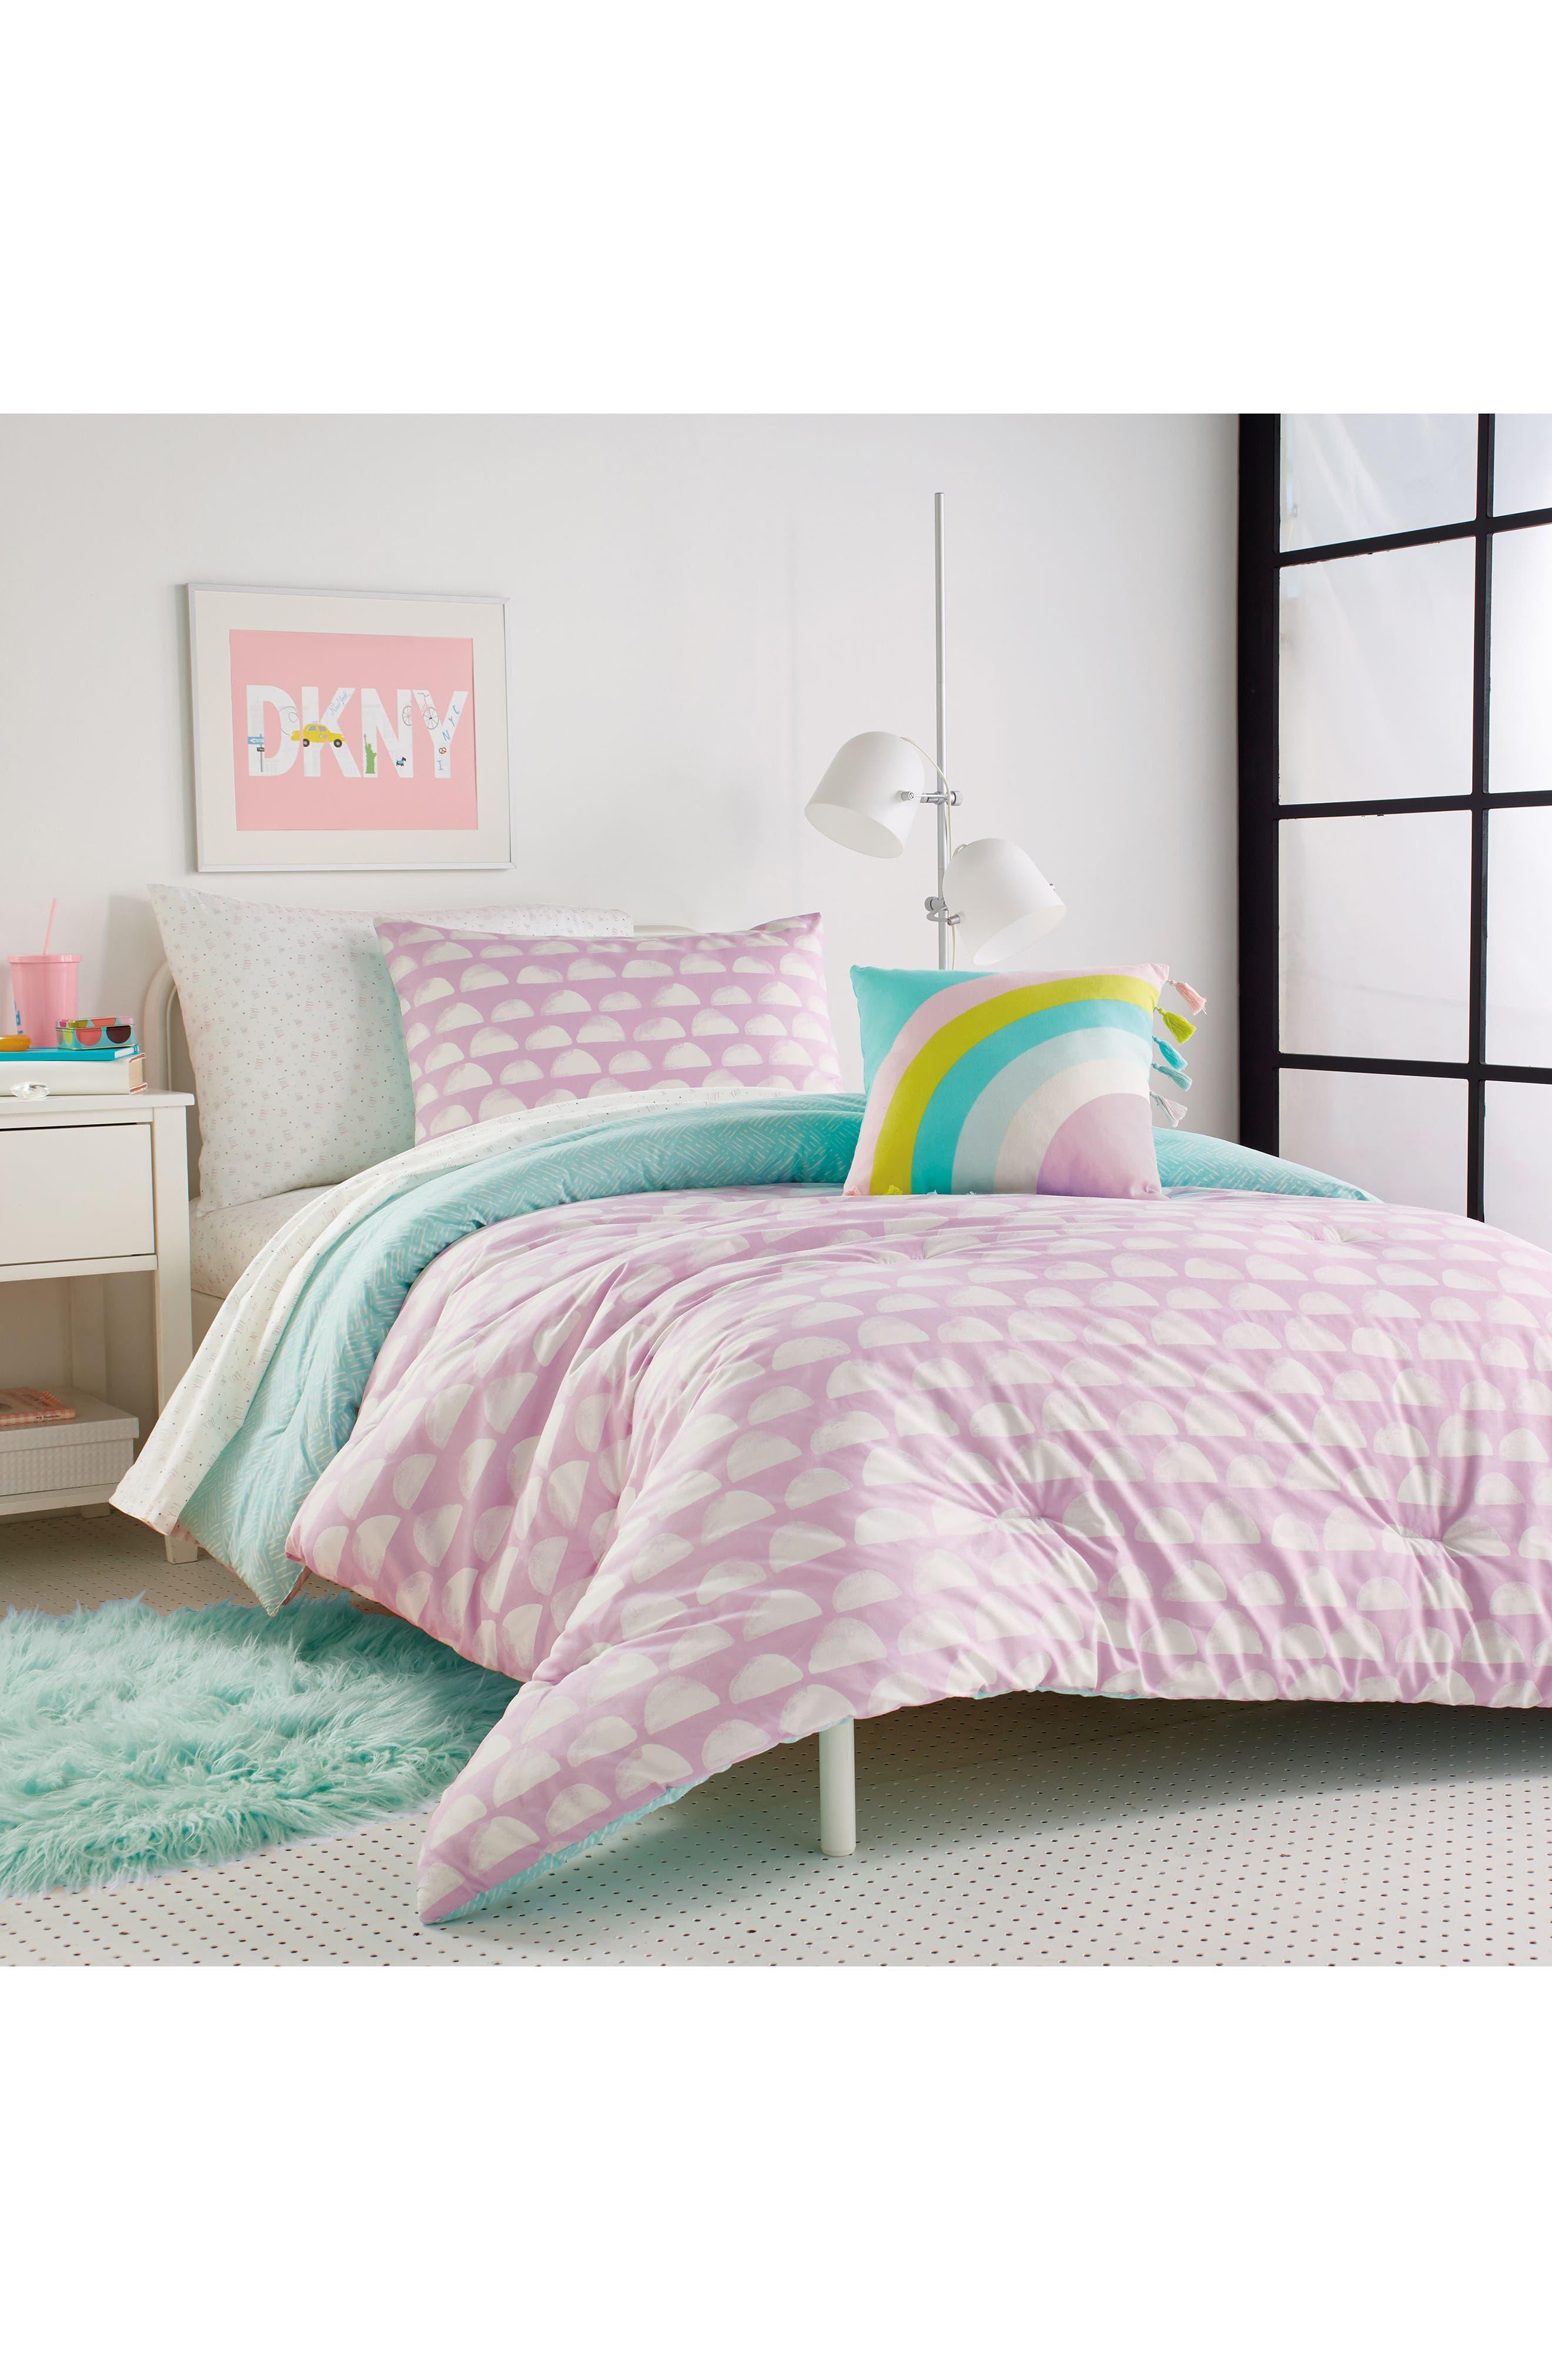 DKNY, Over the Moon Comforter, Sham & Accent Pillow Set, Alternate thumbnail 5, color, PURPLE